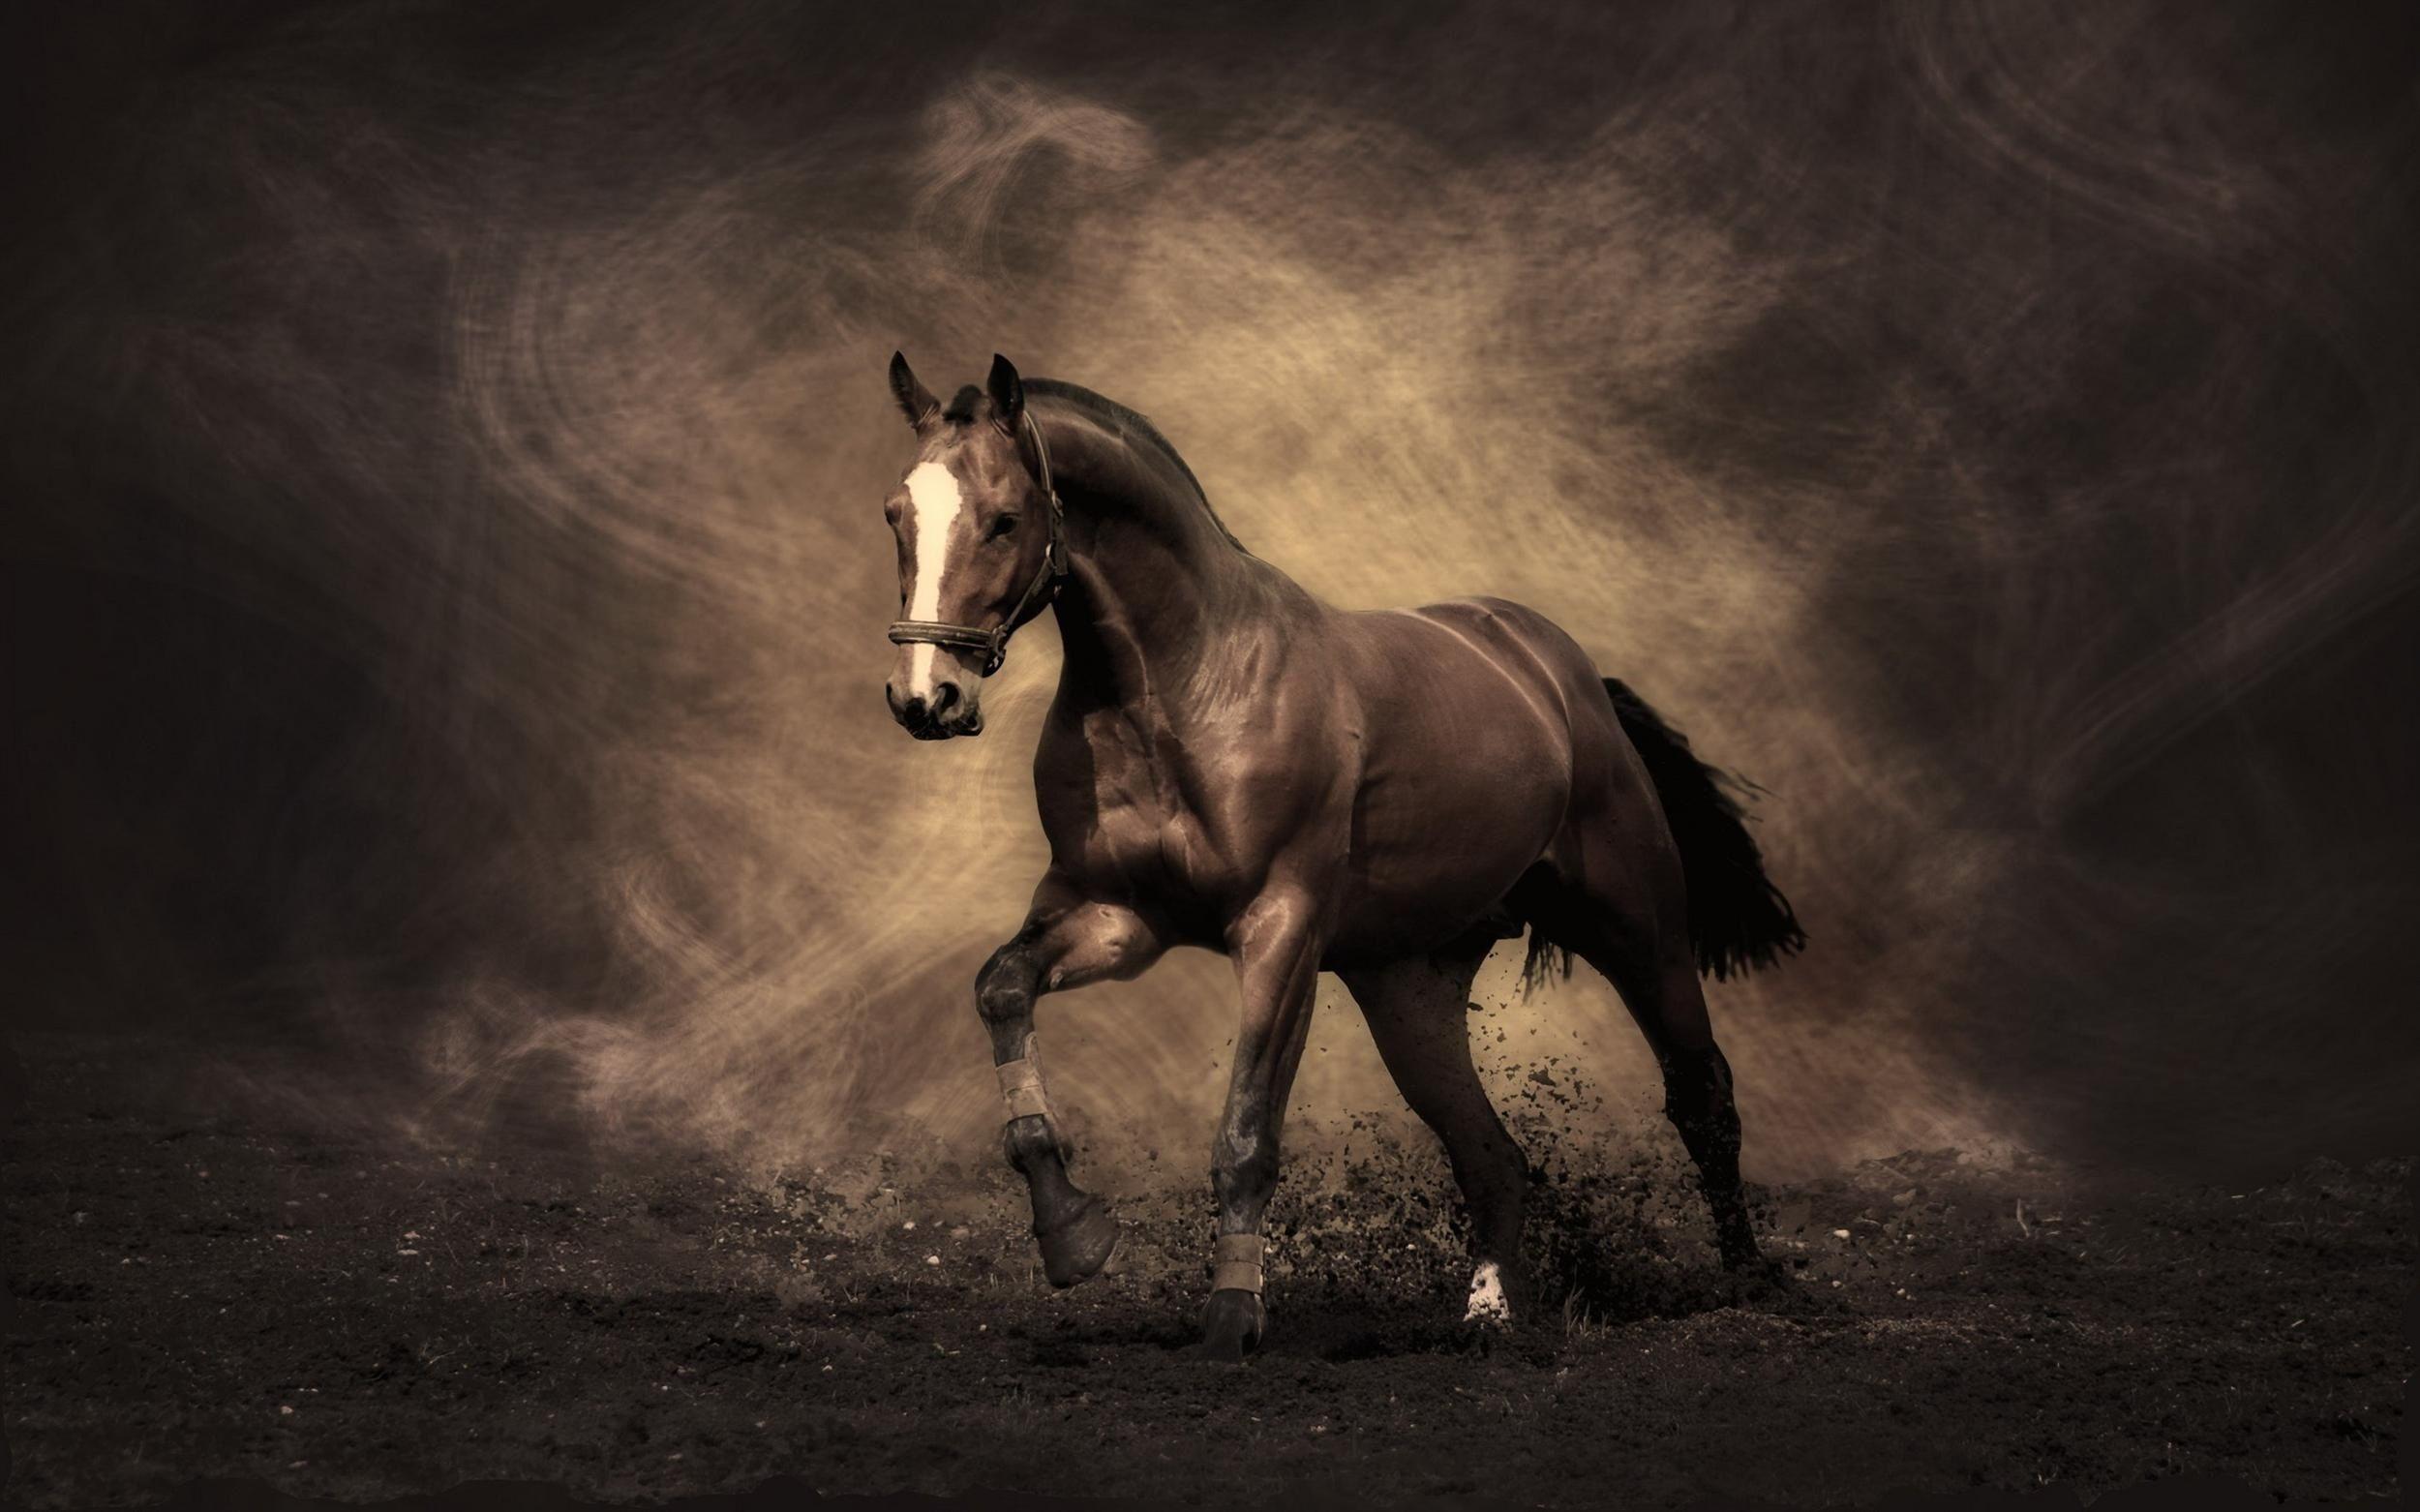 Hd wallpapers hd wallpaper sephia horse colour hd gallery hd wallpapers hd wallpaper sephia horse colour hd gallery voltagebd Image collections